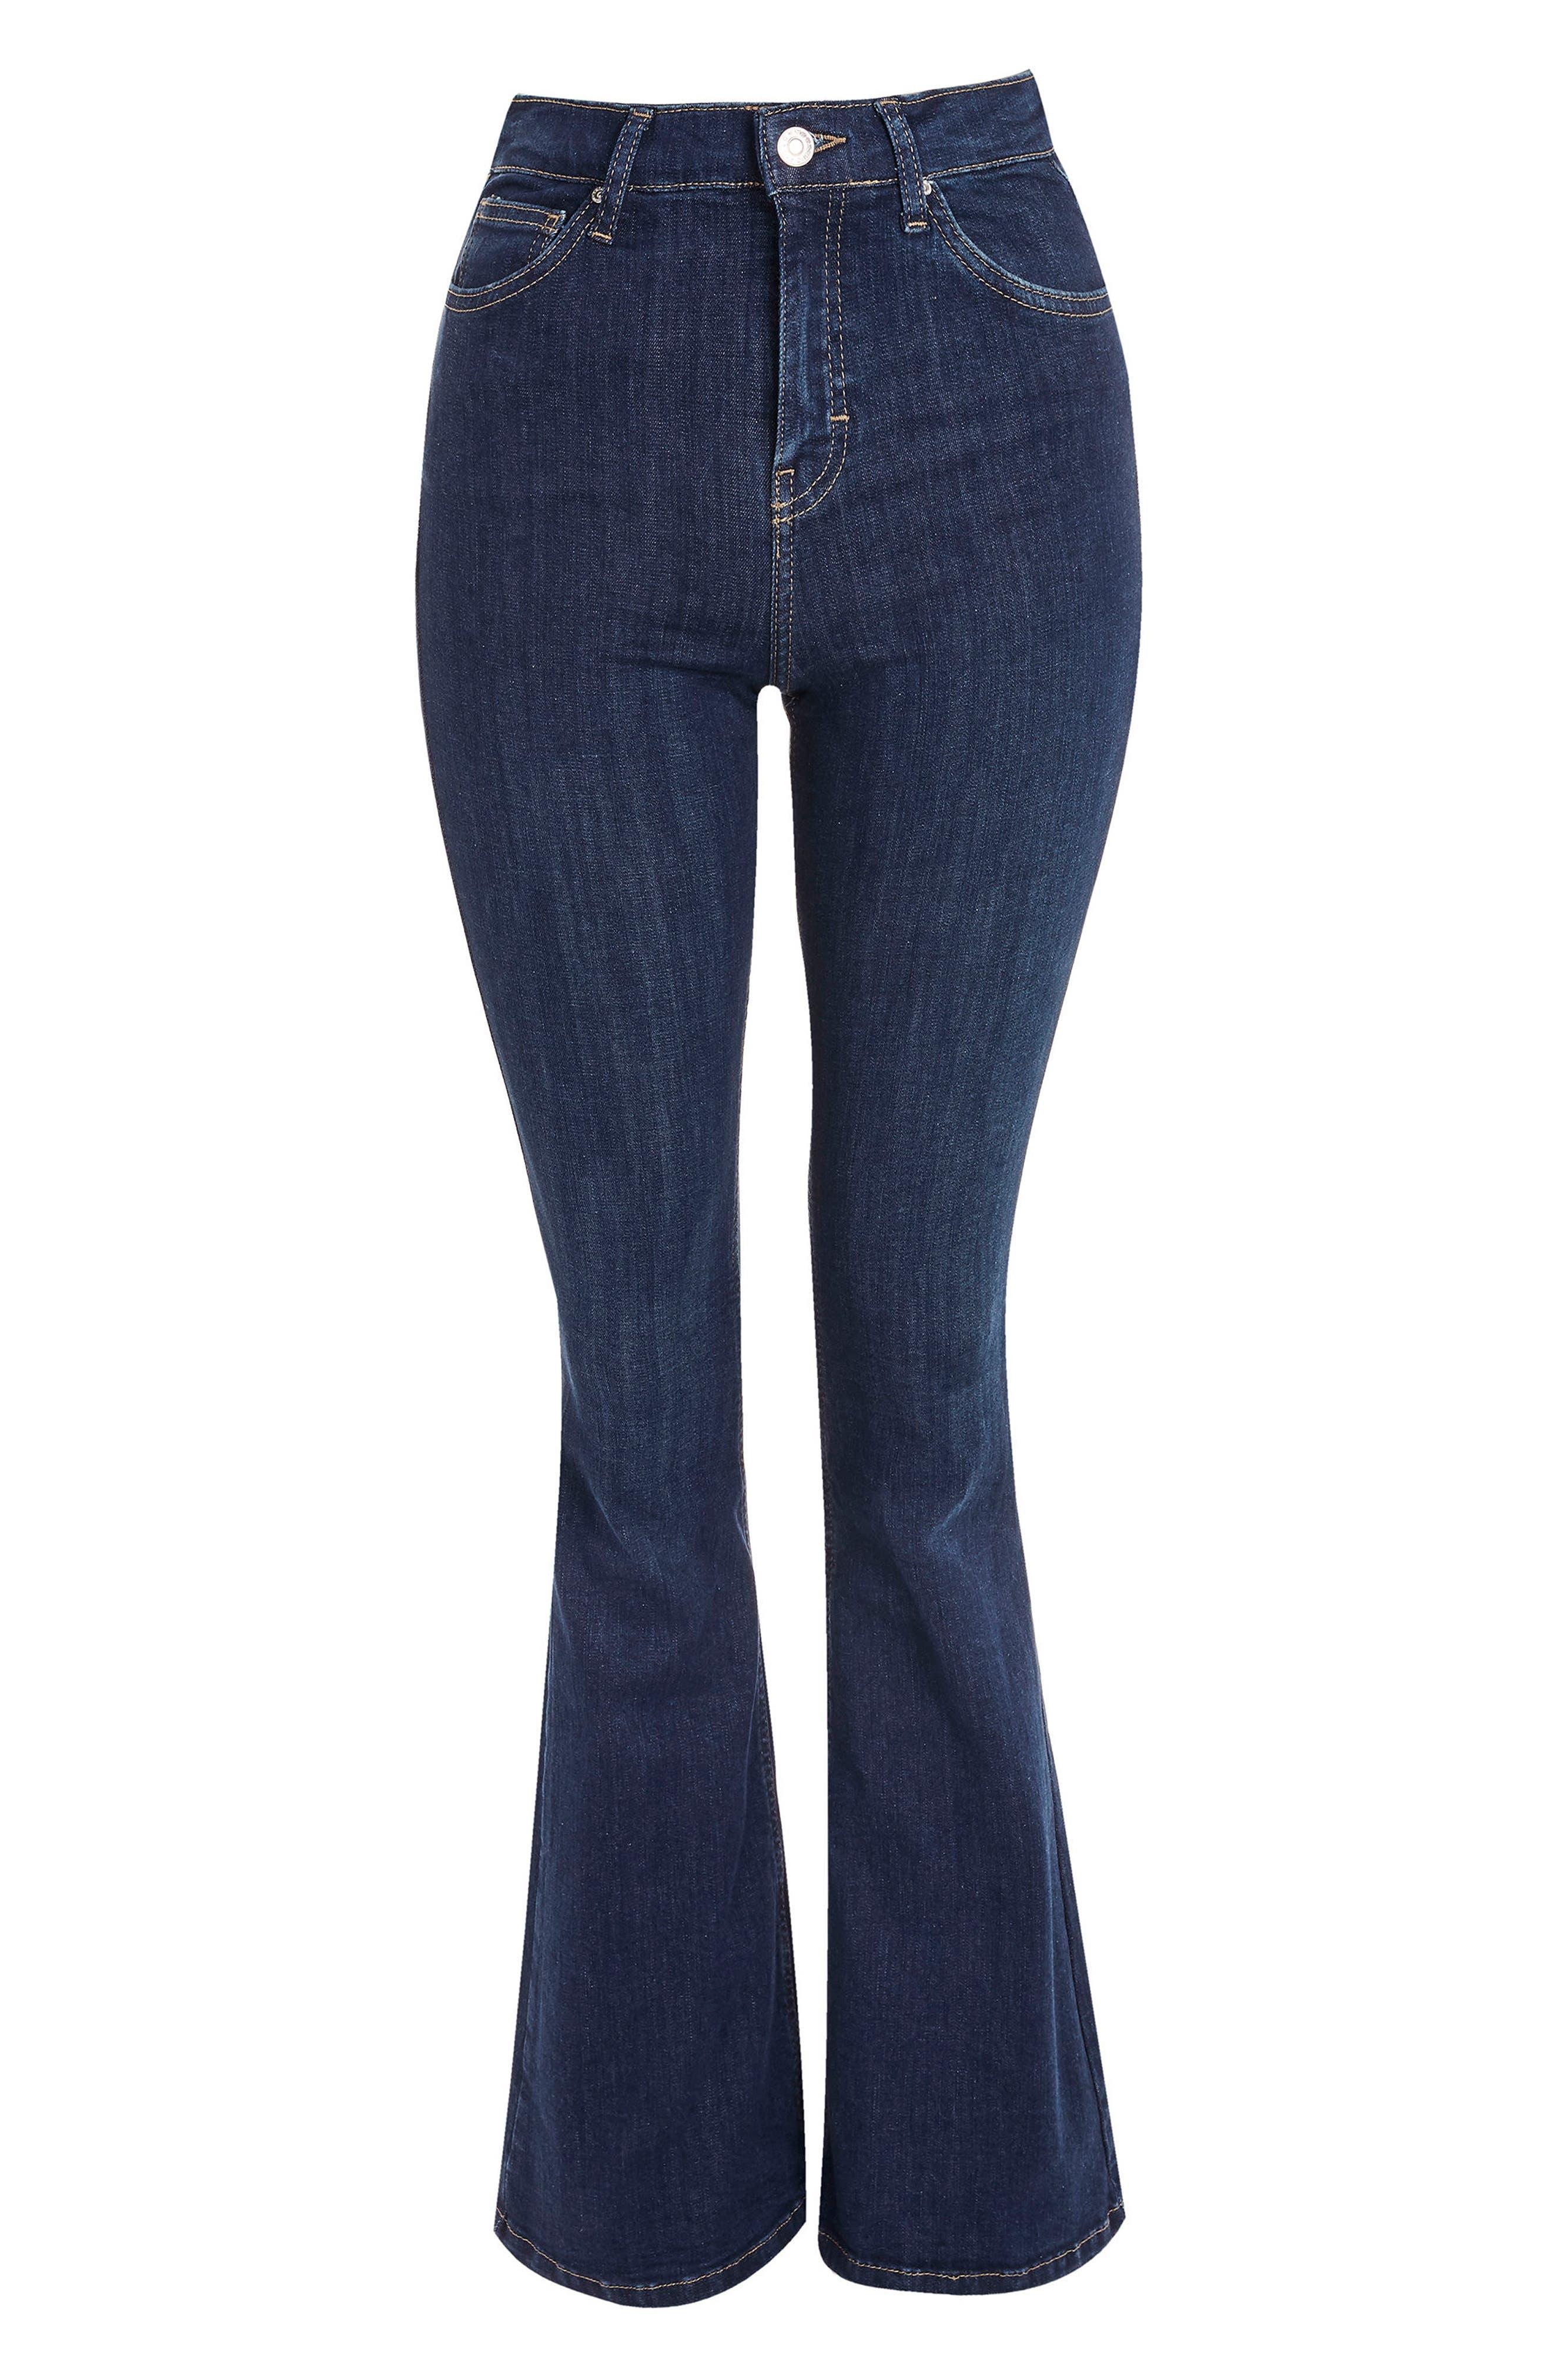 Jamie Petite Flared Jeans,                             Alternate thumbnail 4, color,                             MID DENIM